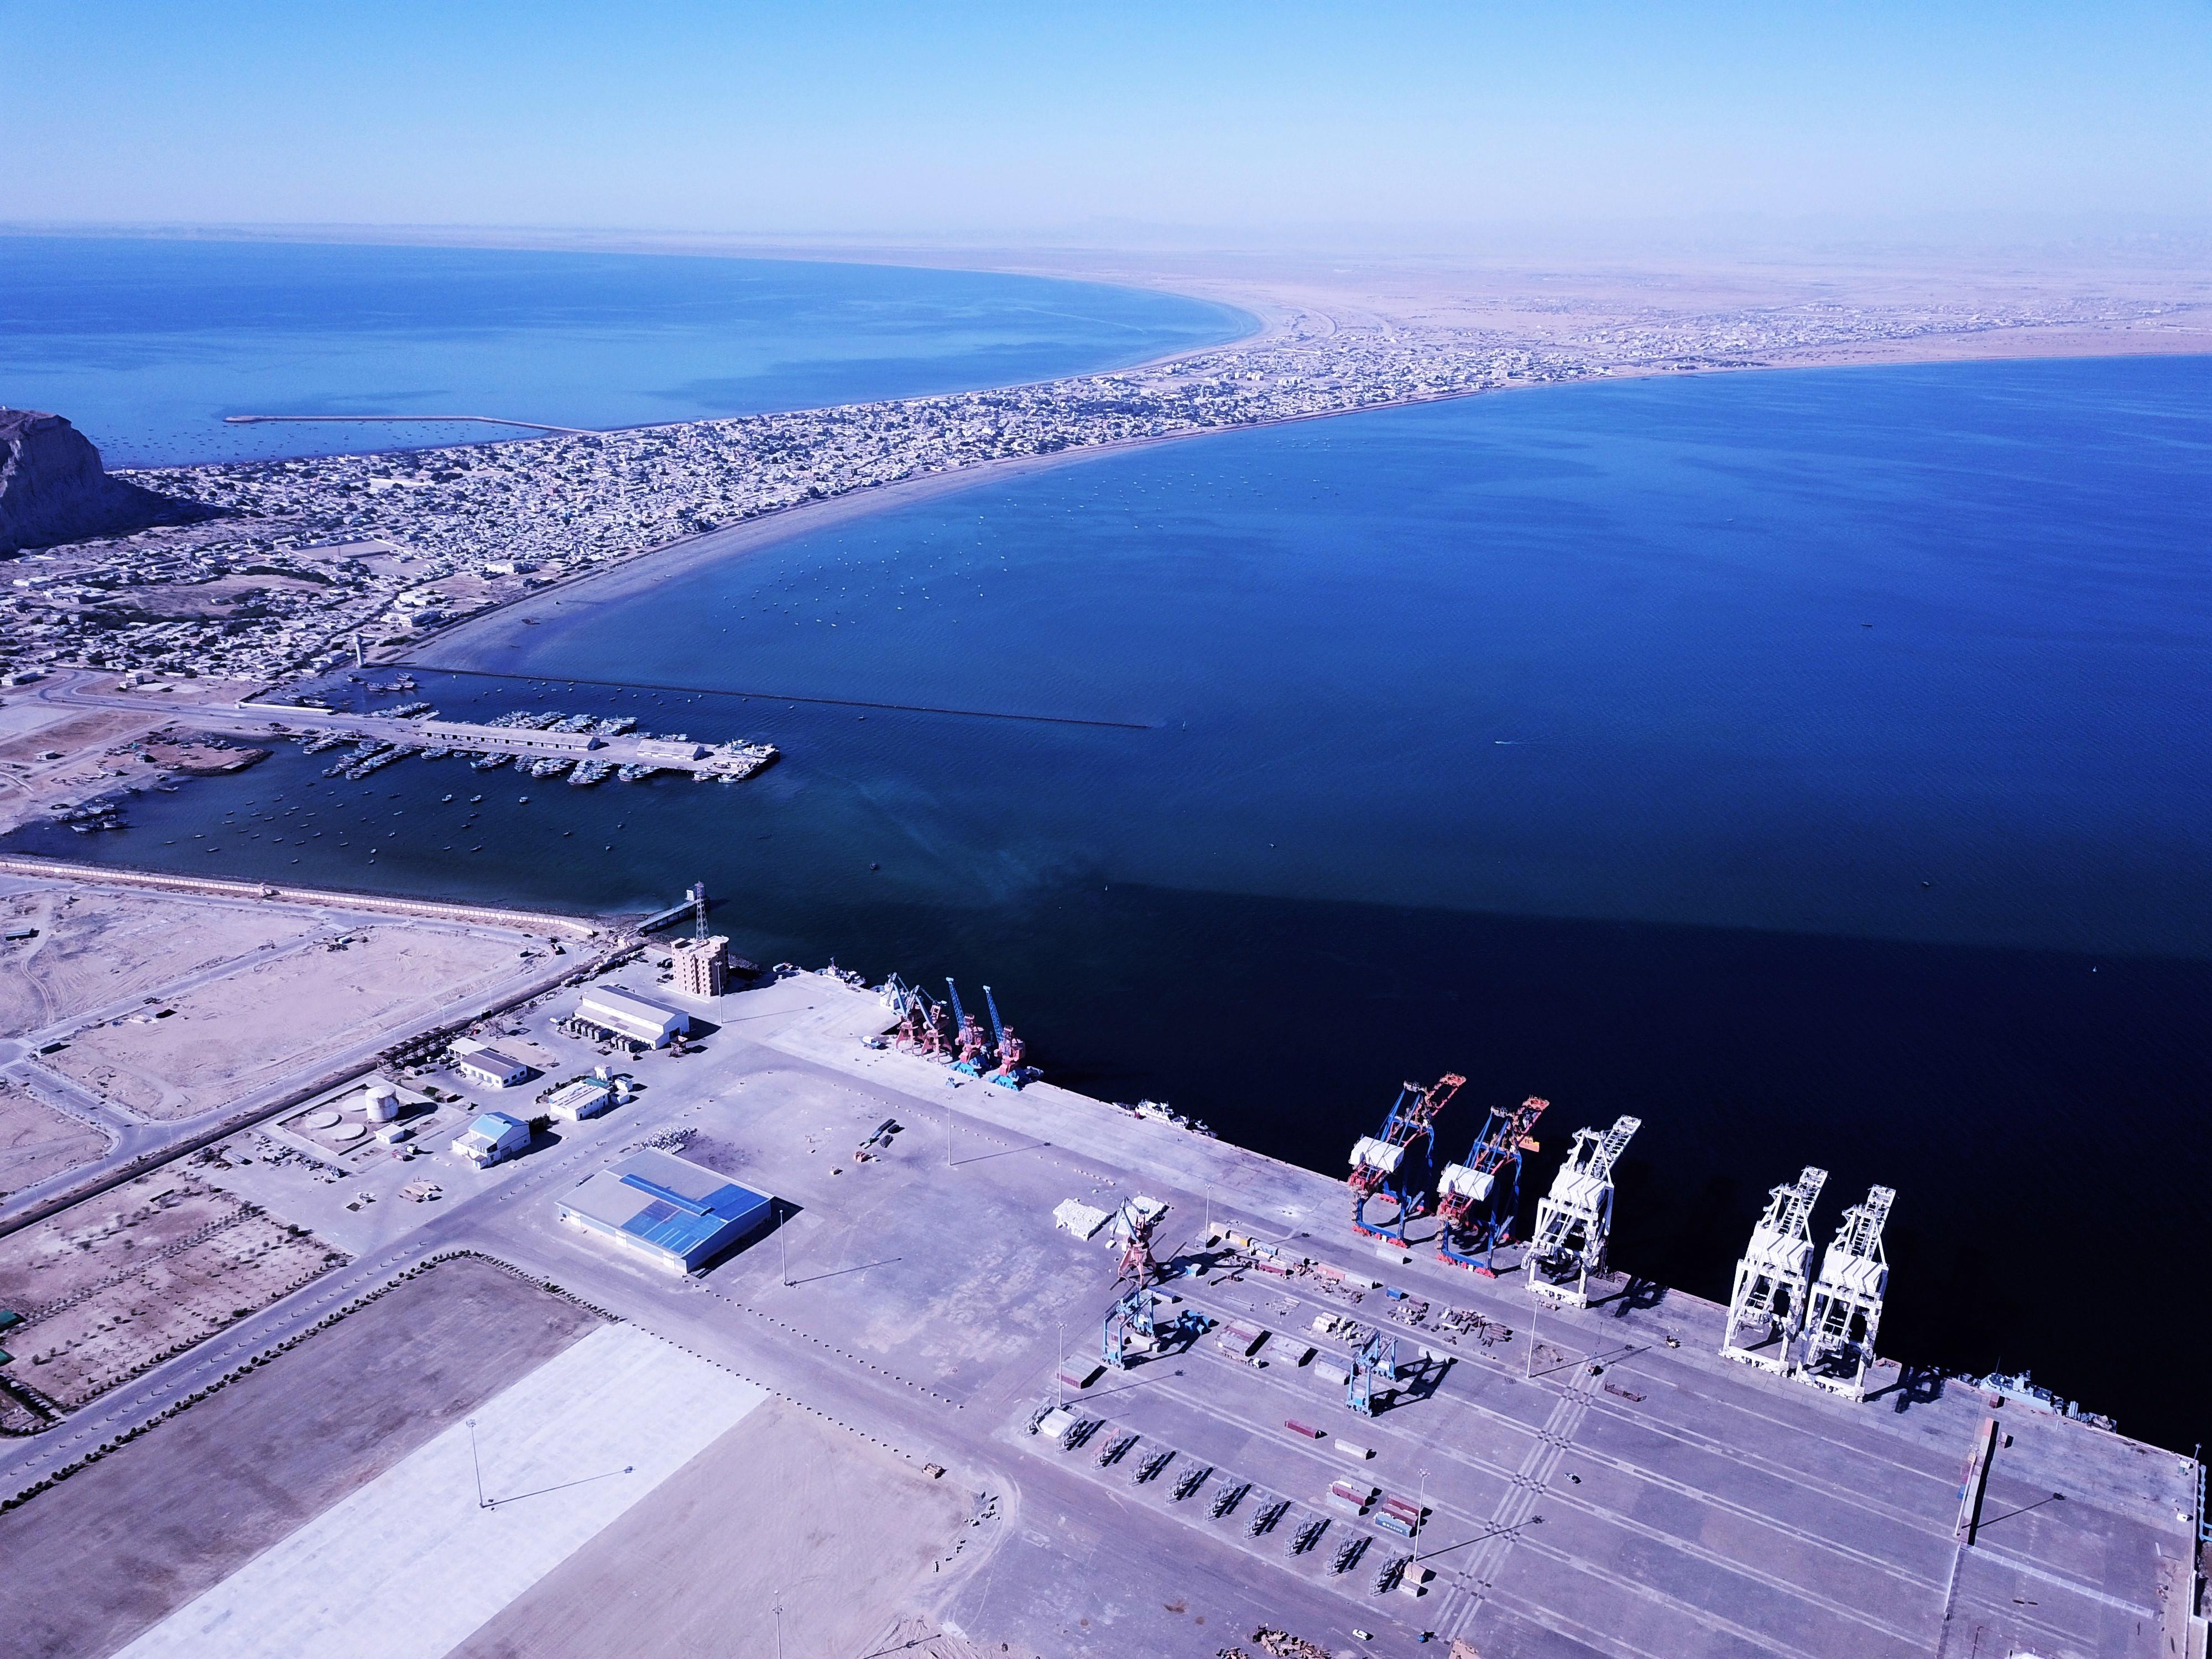 Gwadar Port is 'taking the bright ship of development'